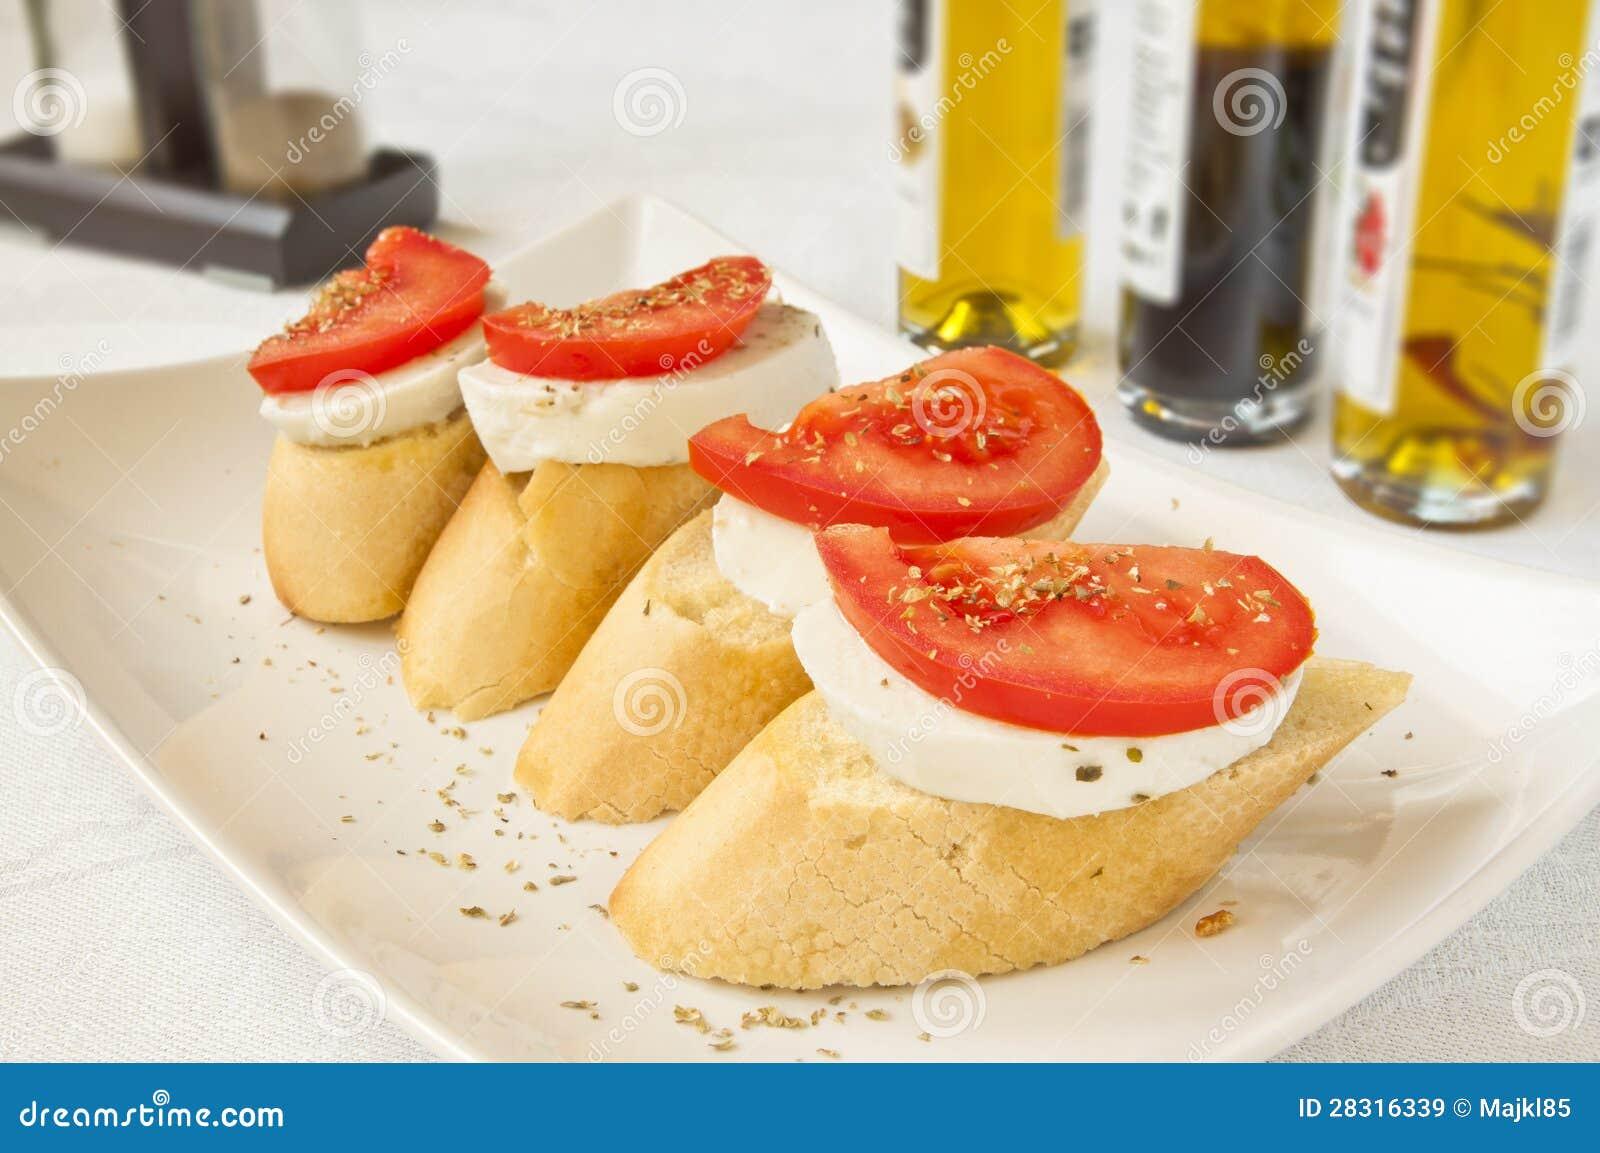 Italian breakfast royalty free stock images image 28316339 for Italian breakfast